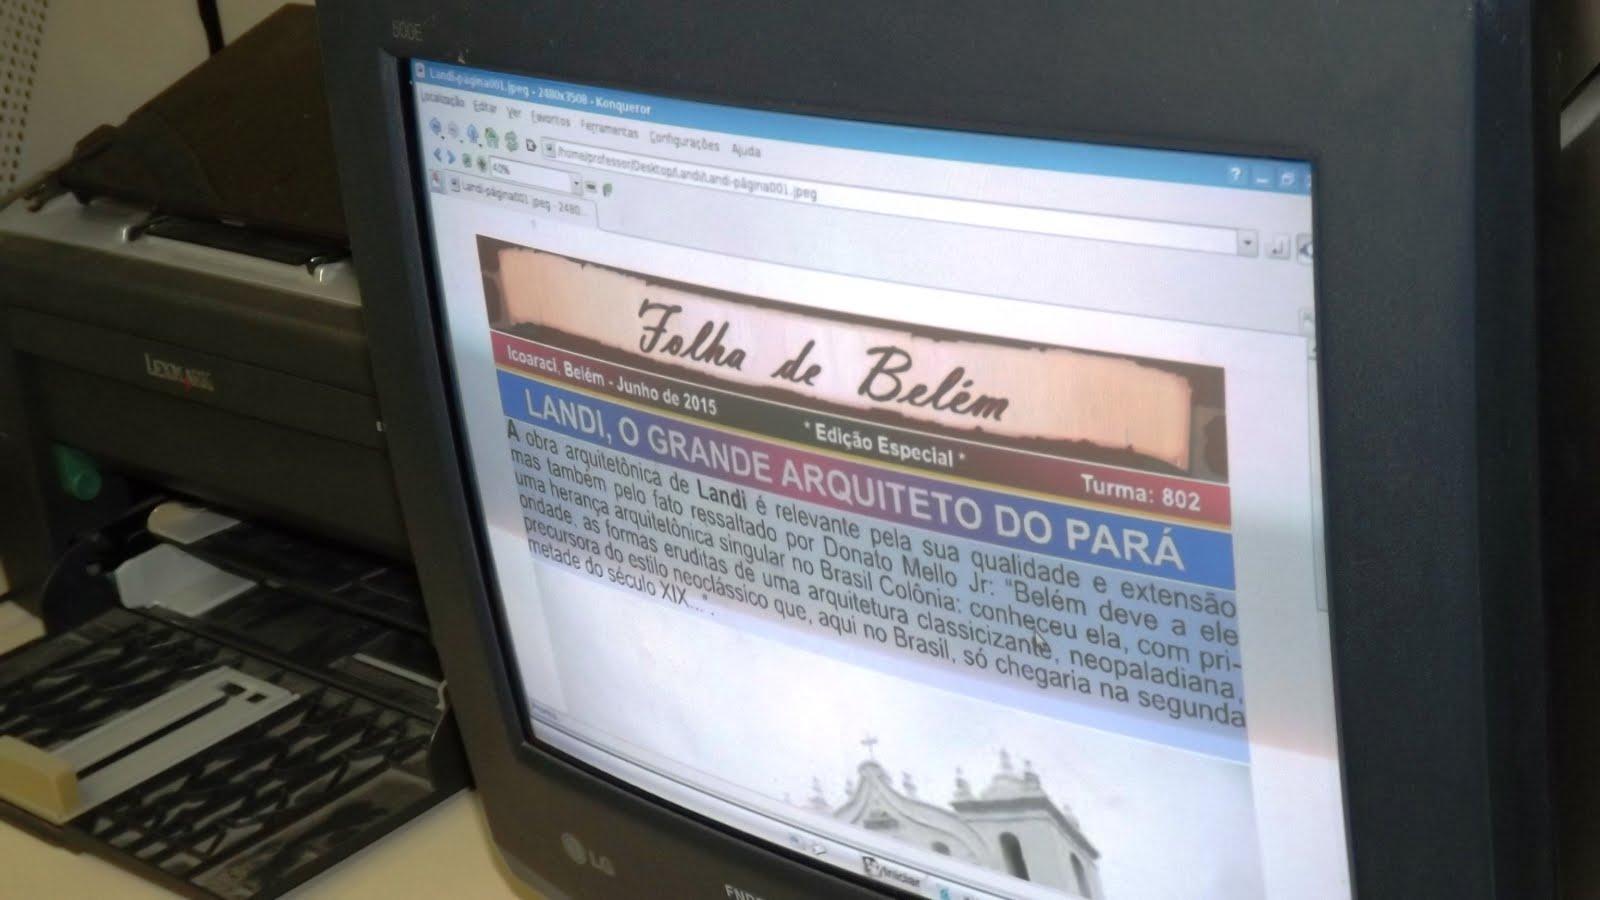 CAPA DO JORNAL FOLHA DE BELÉM